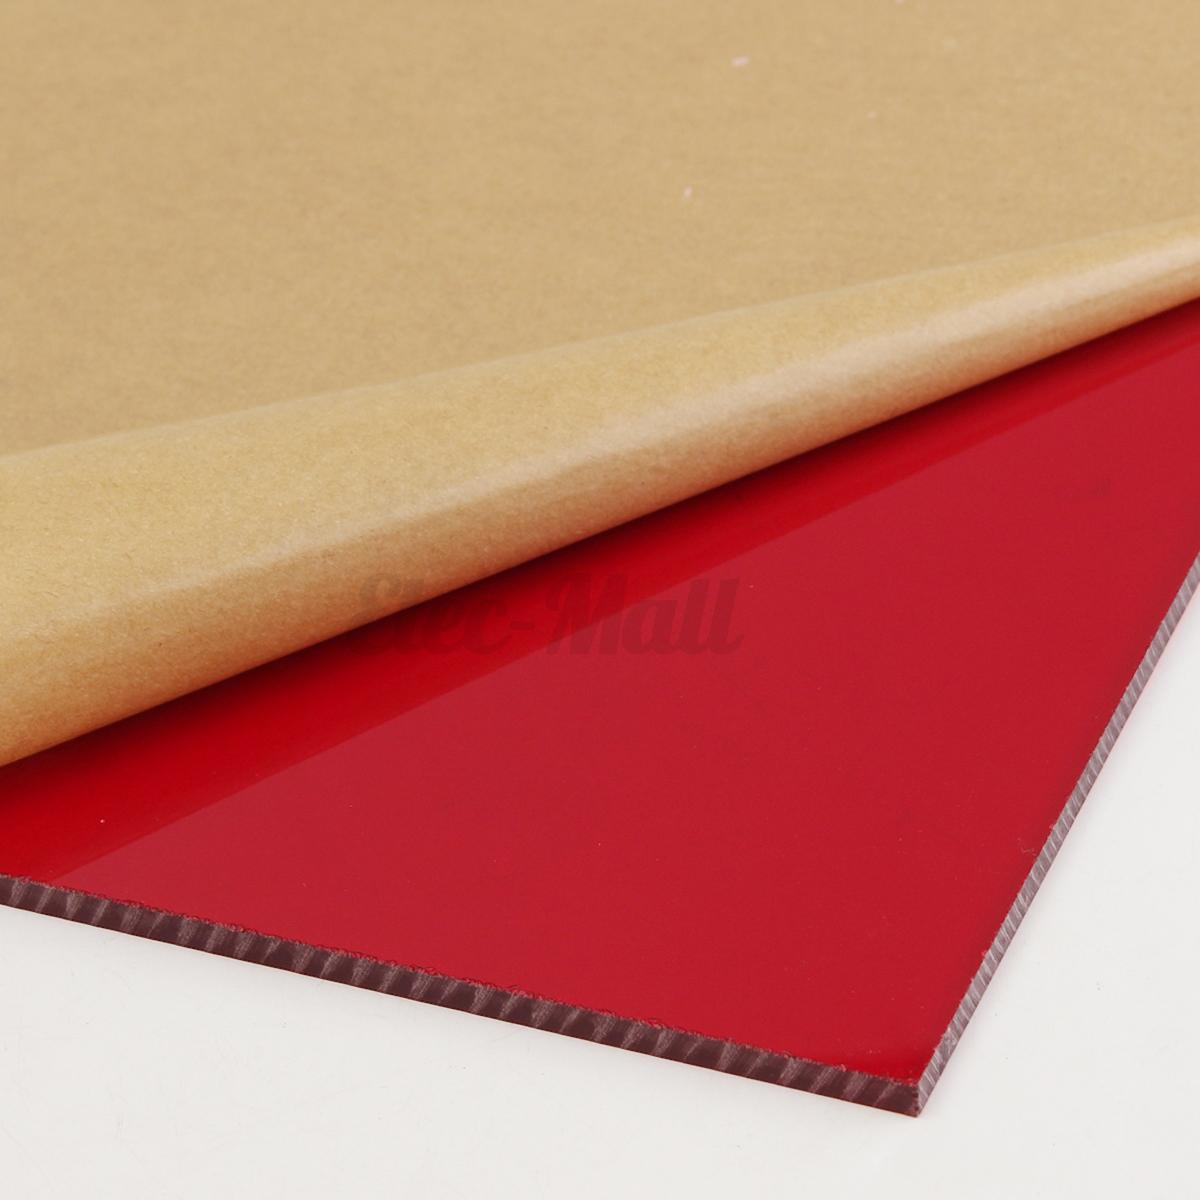 5mm Thick Plastic Panel Clear Acrylic Plexiglass Sheets